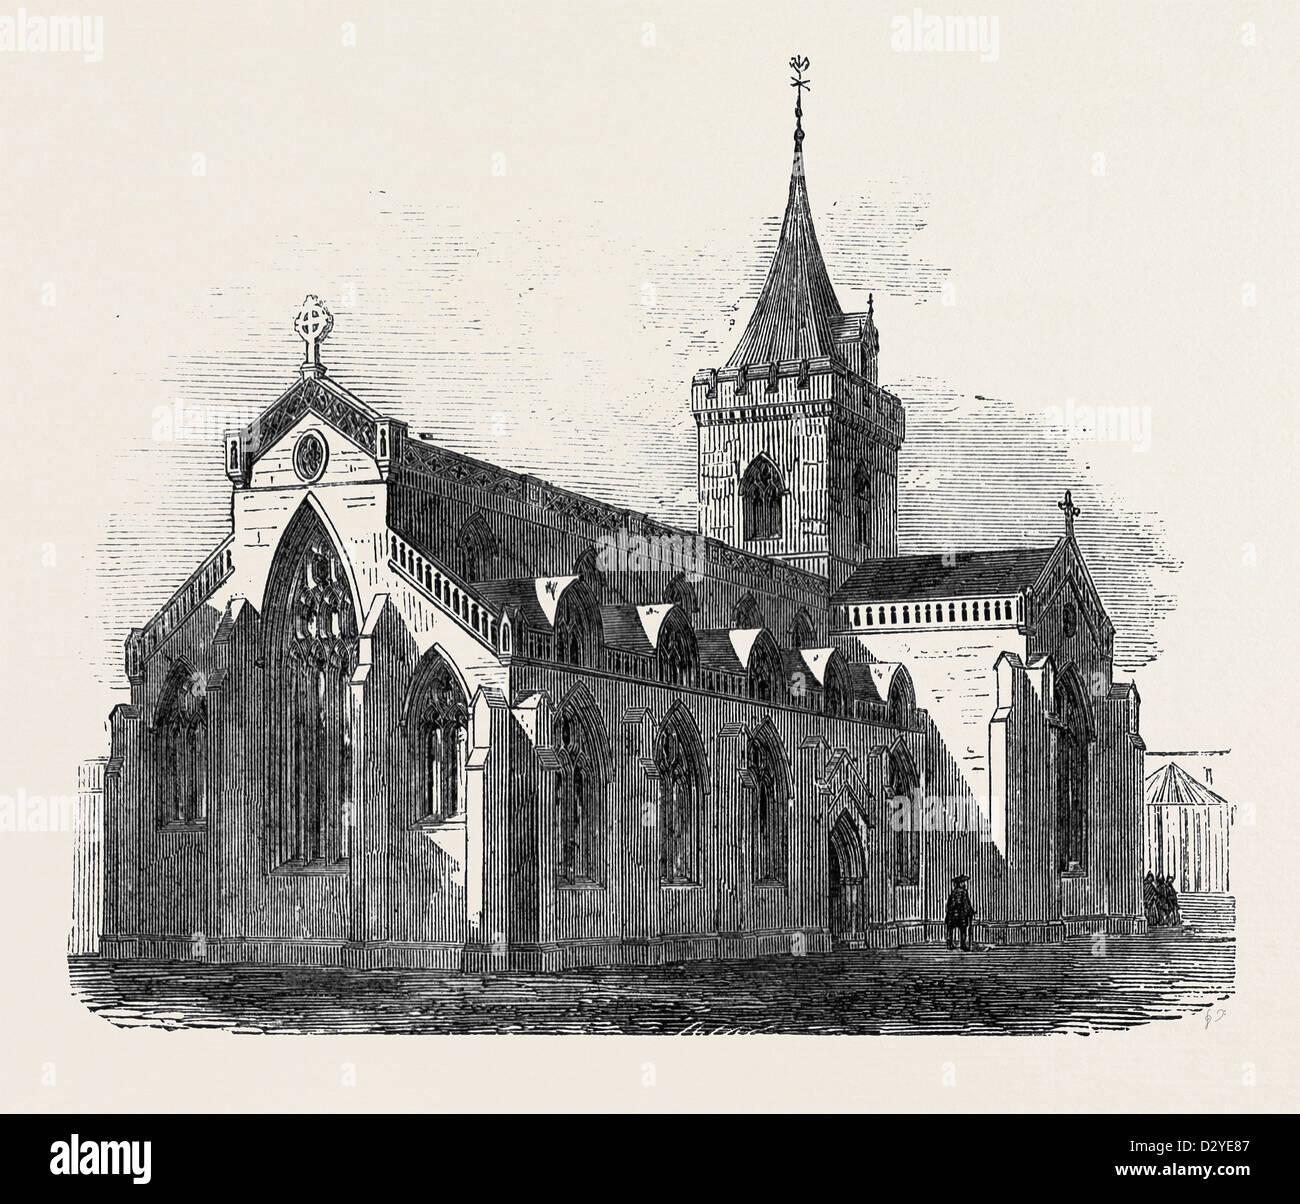 THE CHURCH OF ST. JOHN THE BAPTIST PERTH. - Stock Image